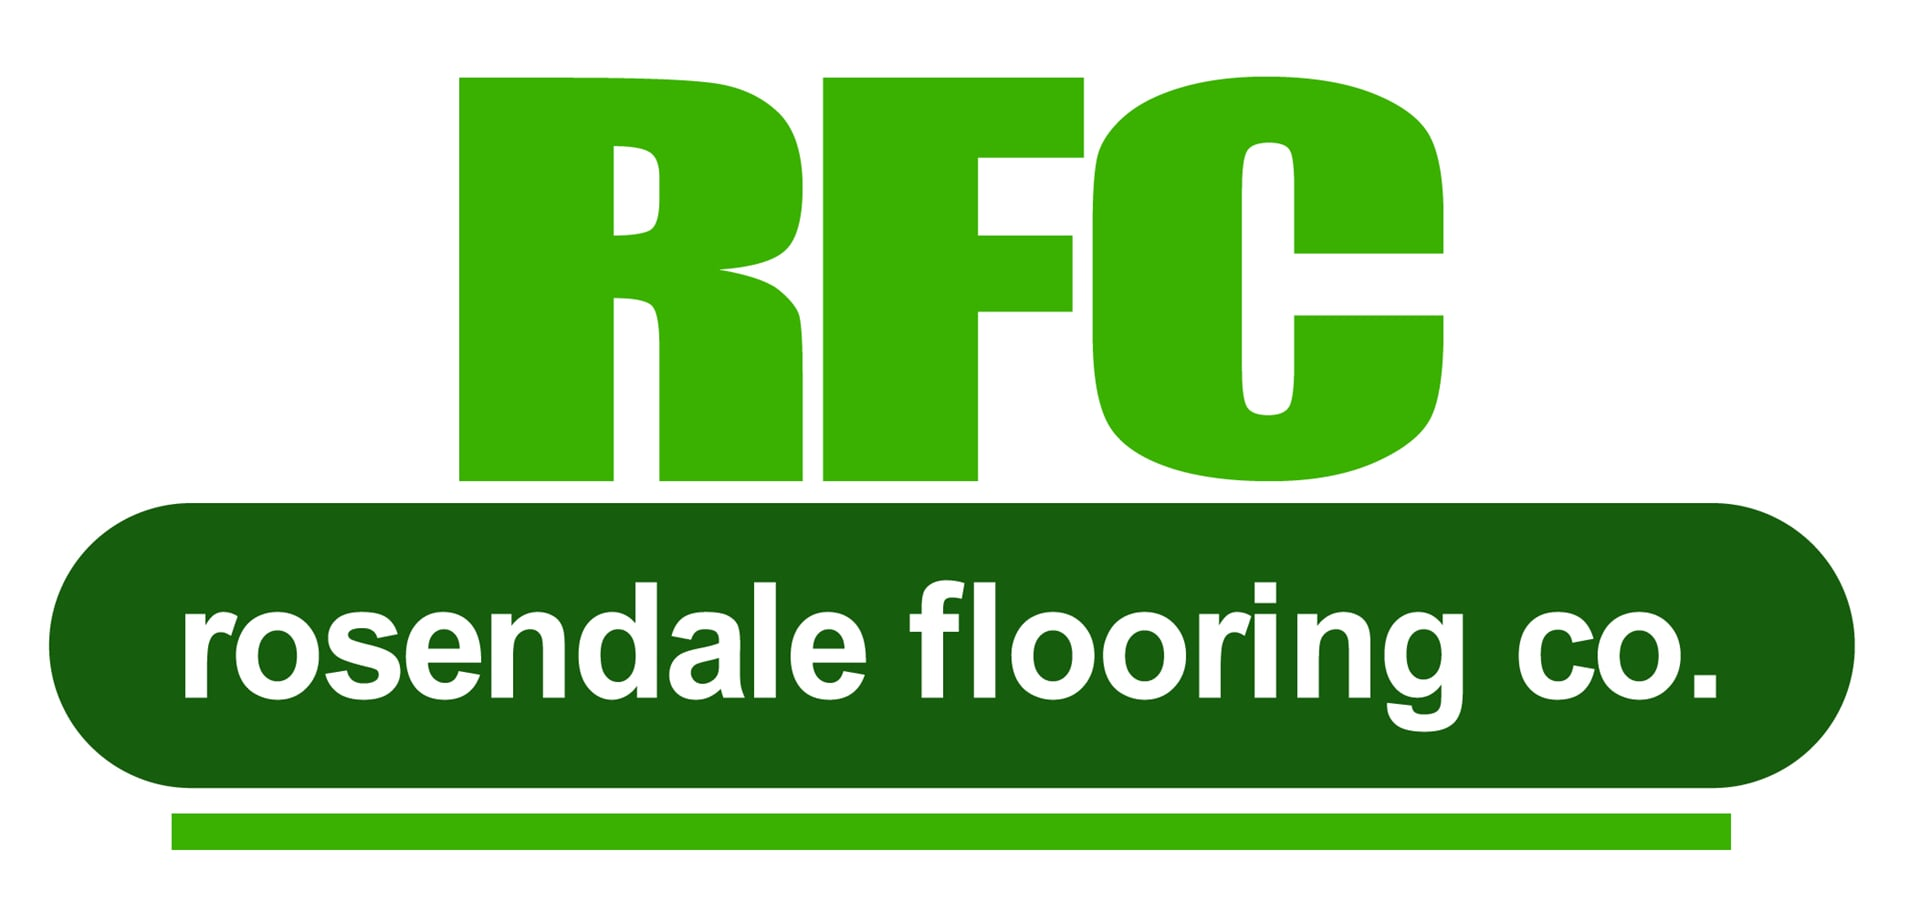 Rosendale Flooring Company in Rosendale, NY